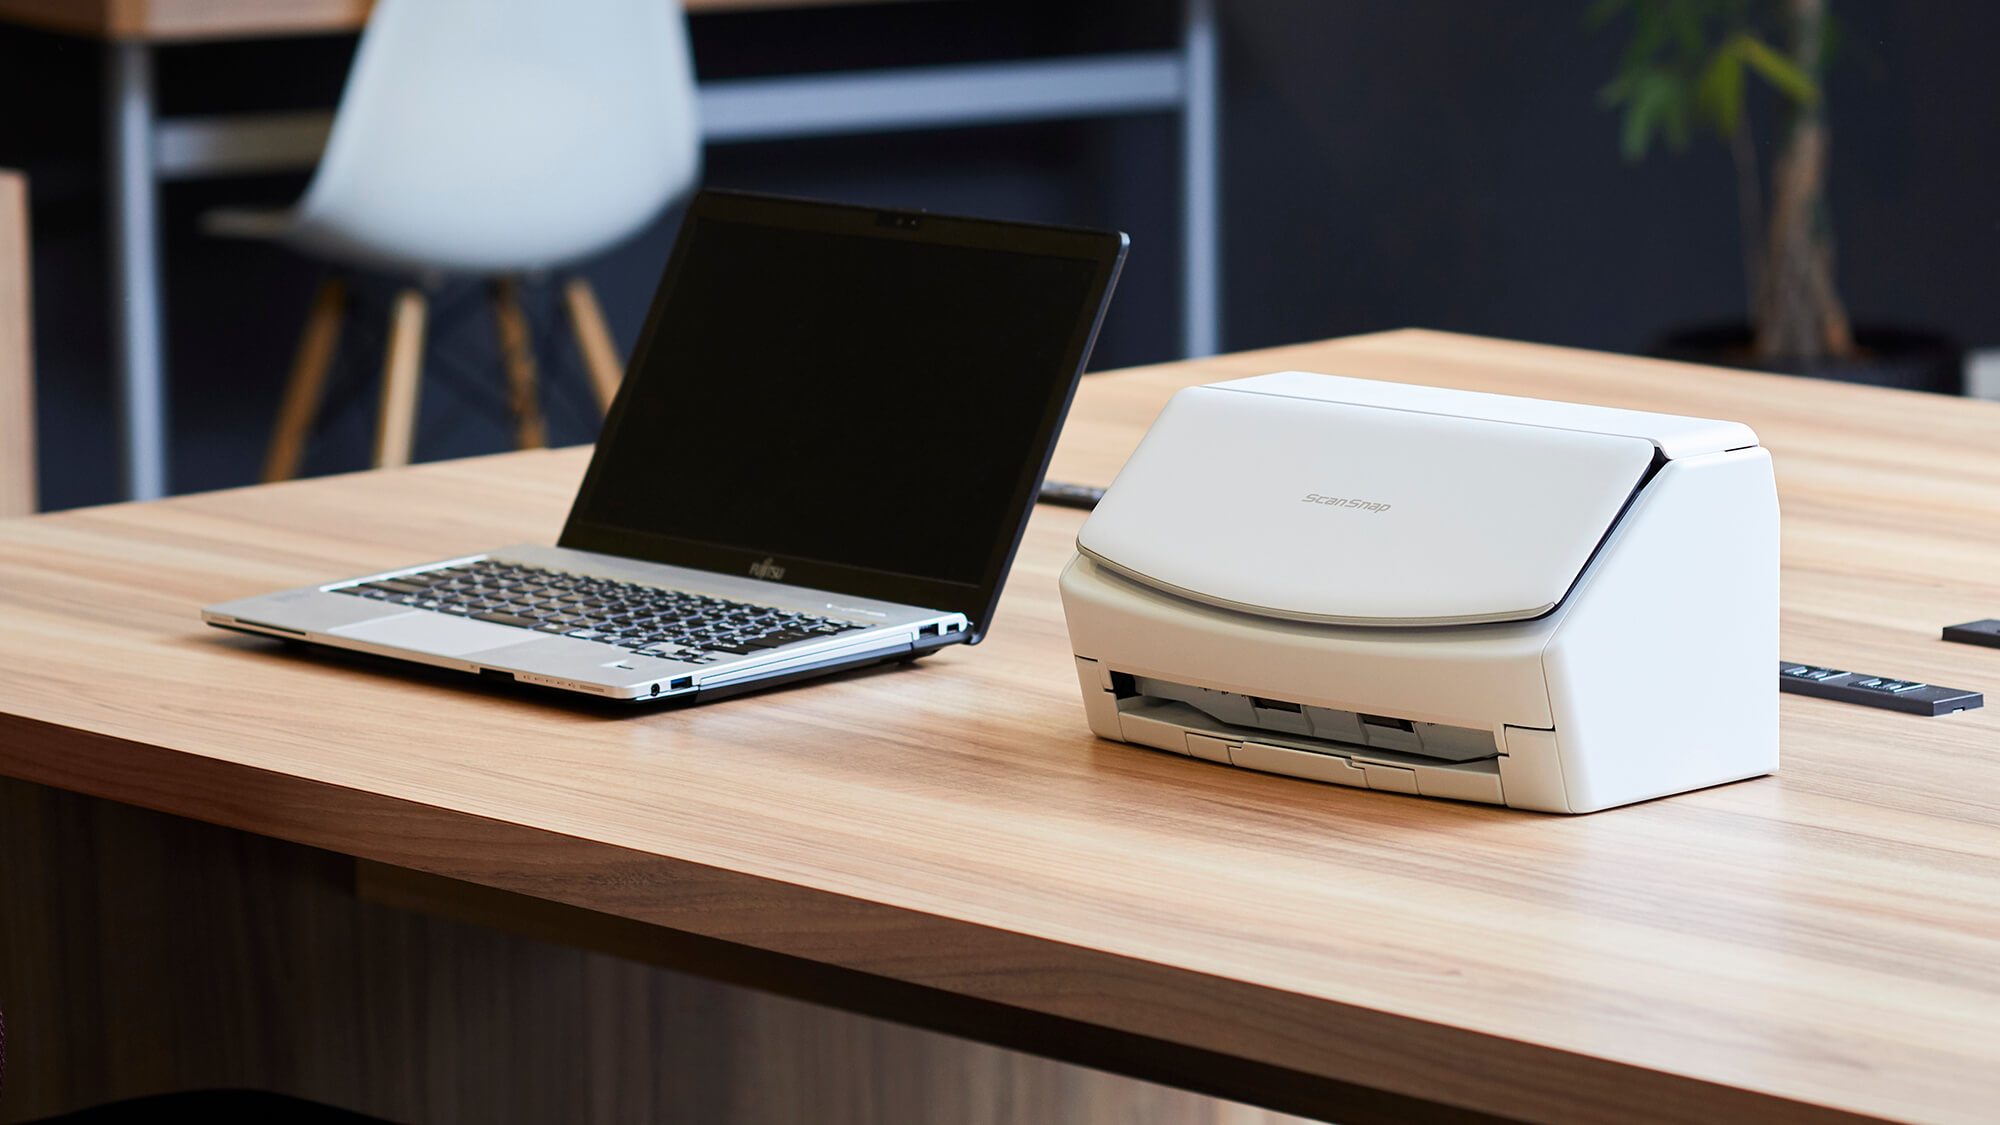 Máy scan Fujitsu Scansnap ix1500